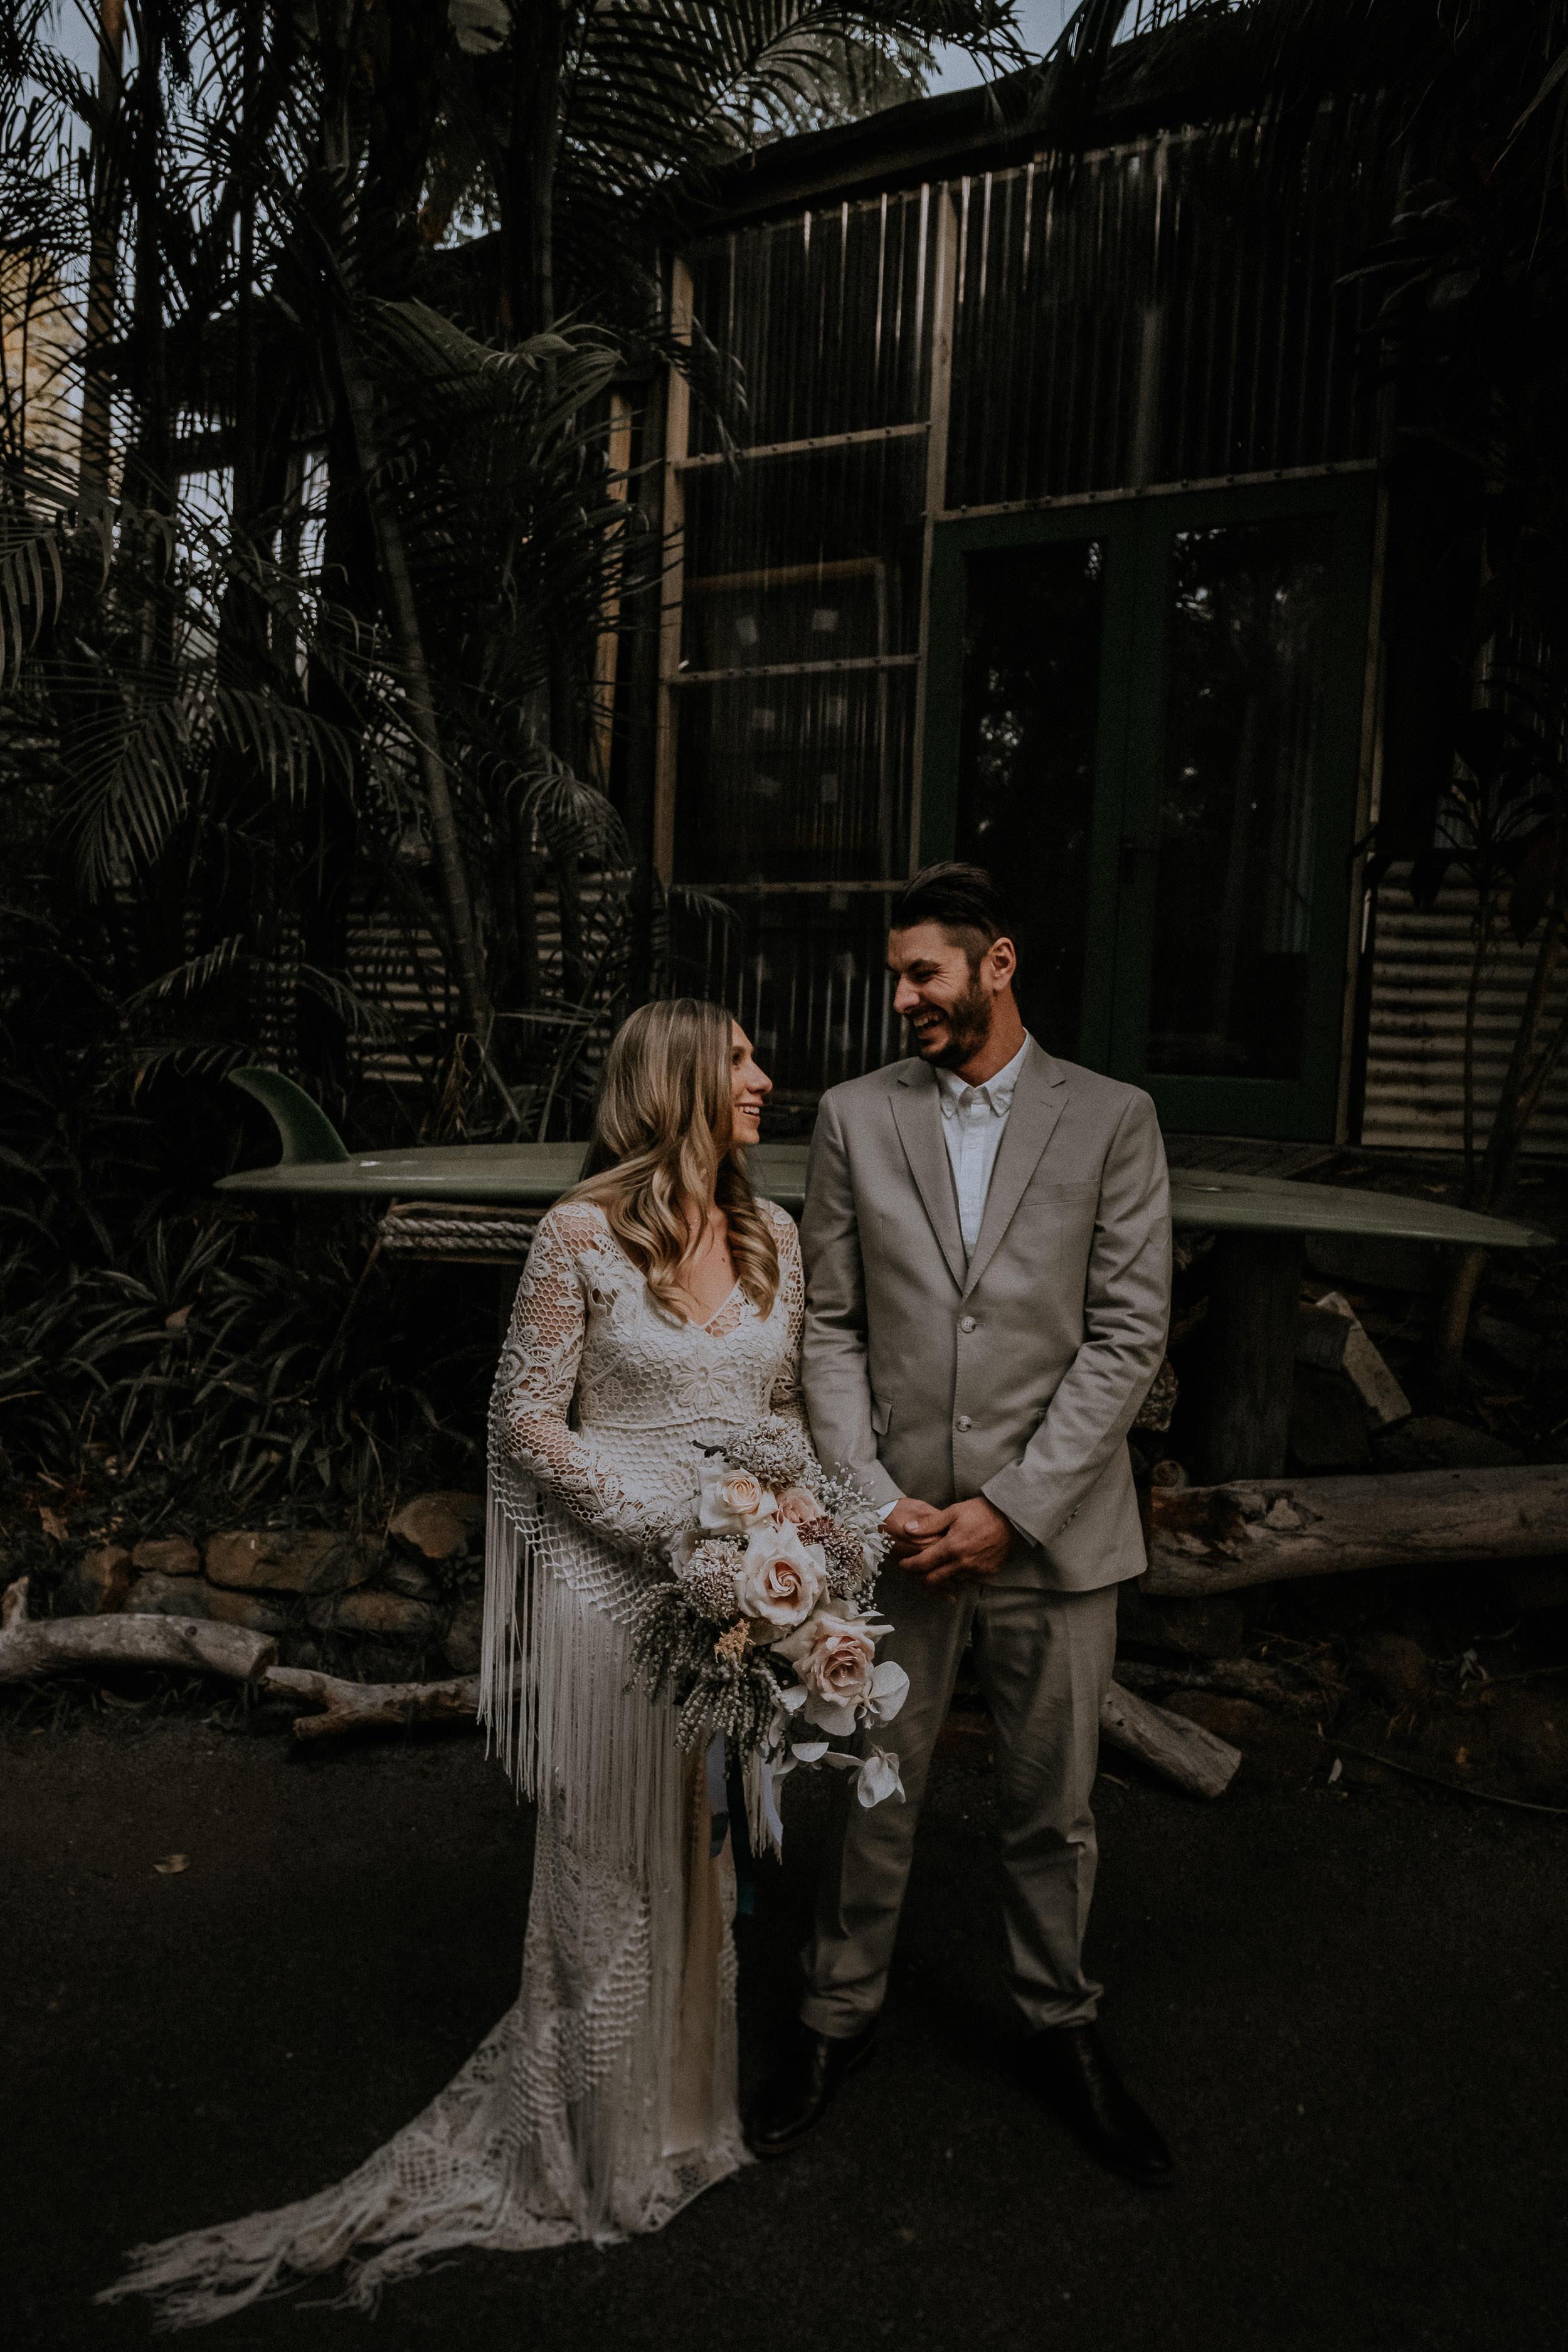 S&A Elopement - Kings & Thieves - Shred 'Til Dead - Central Coast Beach Forest Wedding - 318.jpg